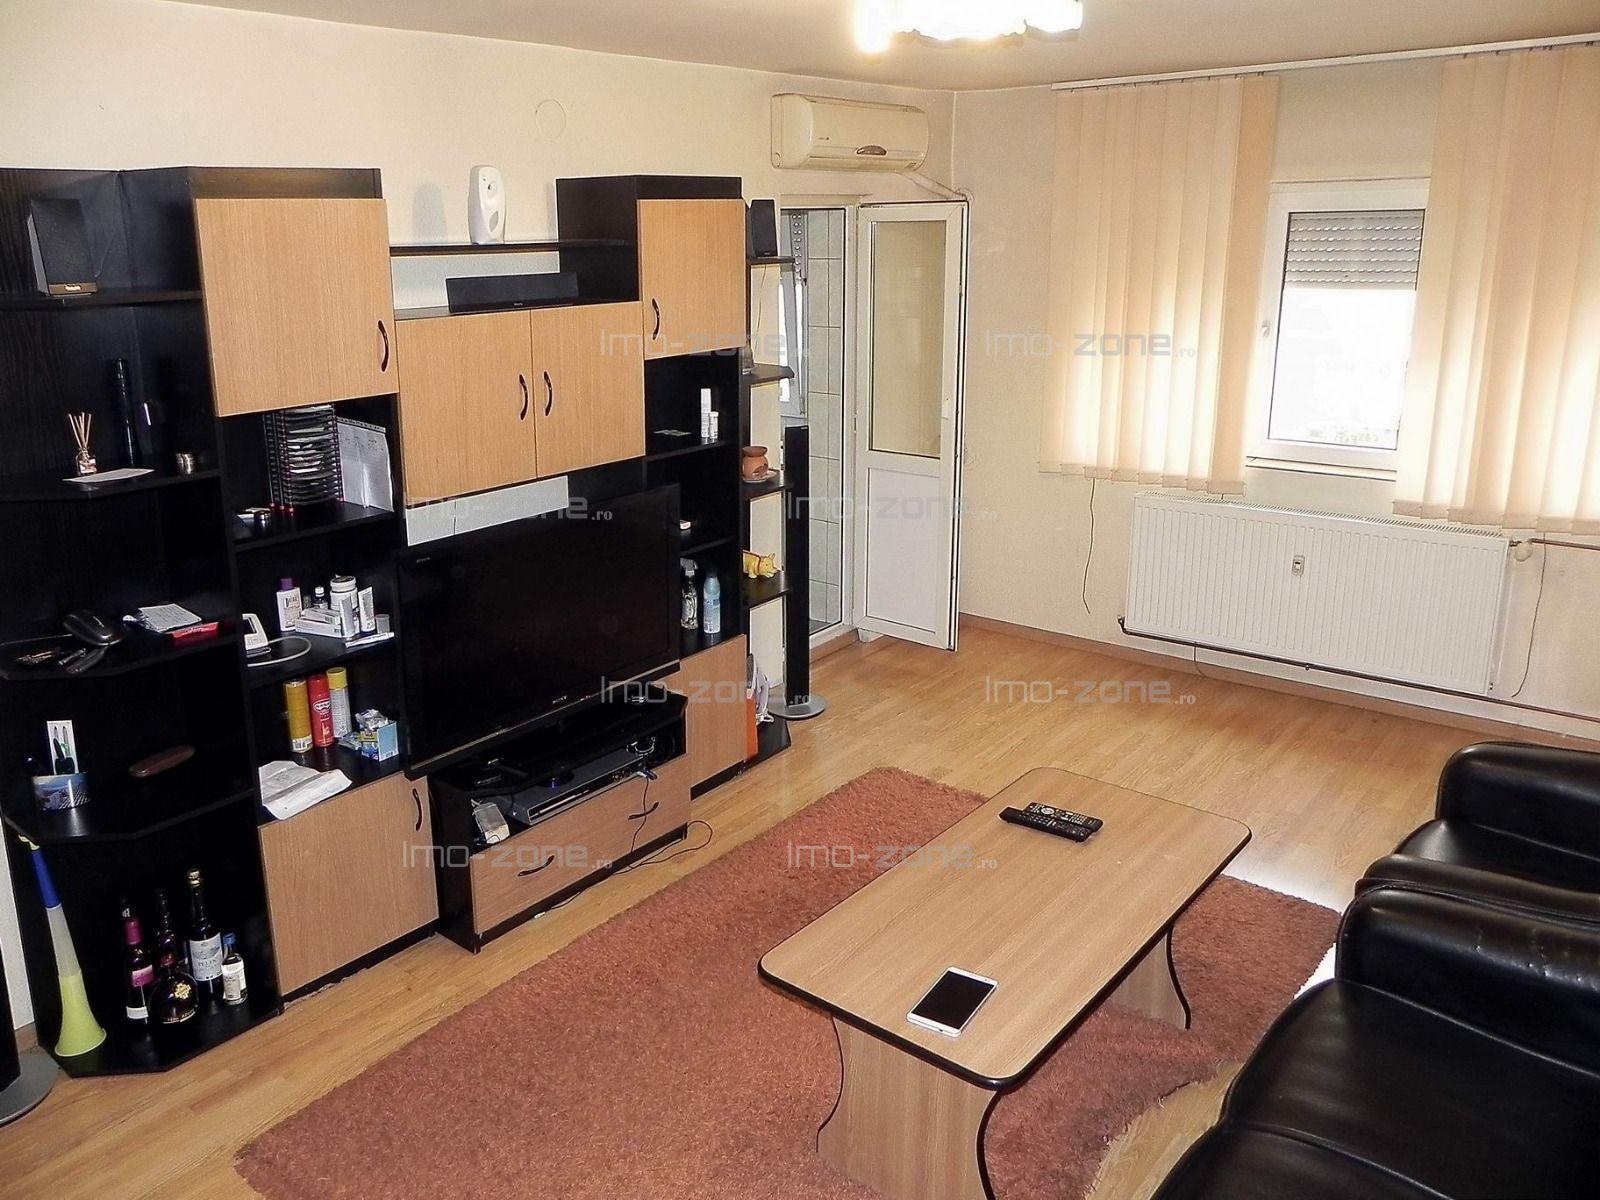 Apartament cu 3 camere  Apusului  Militari